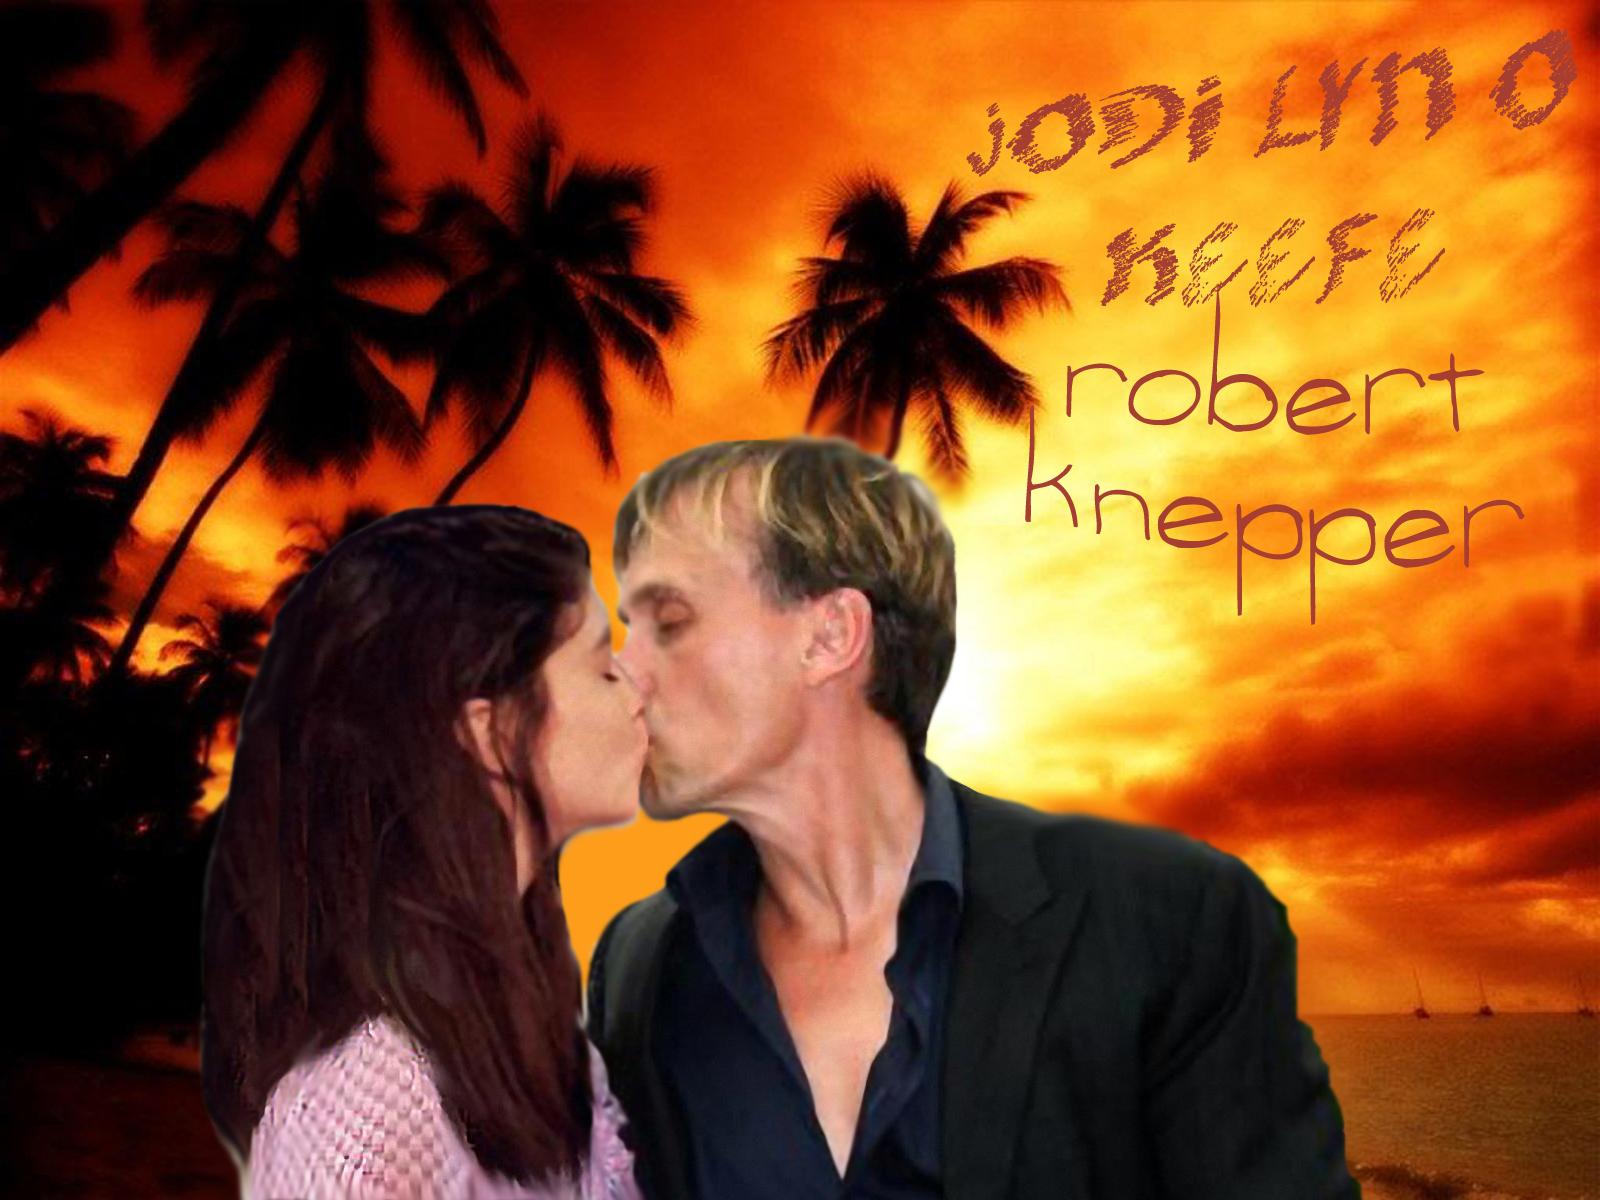 Robert Knepper/Jodi Lyn O'Keefe वॉलपेपर